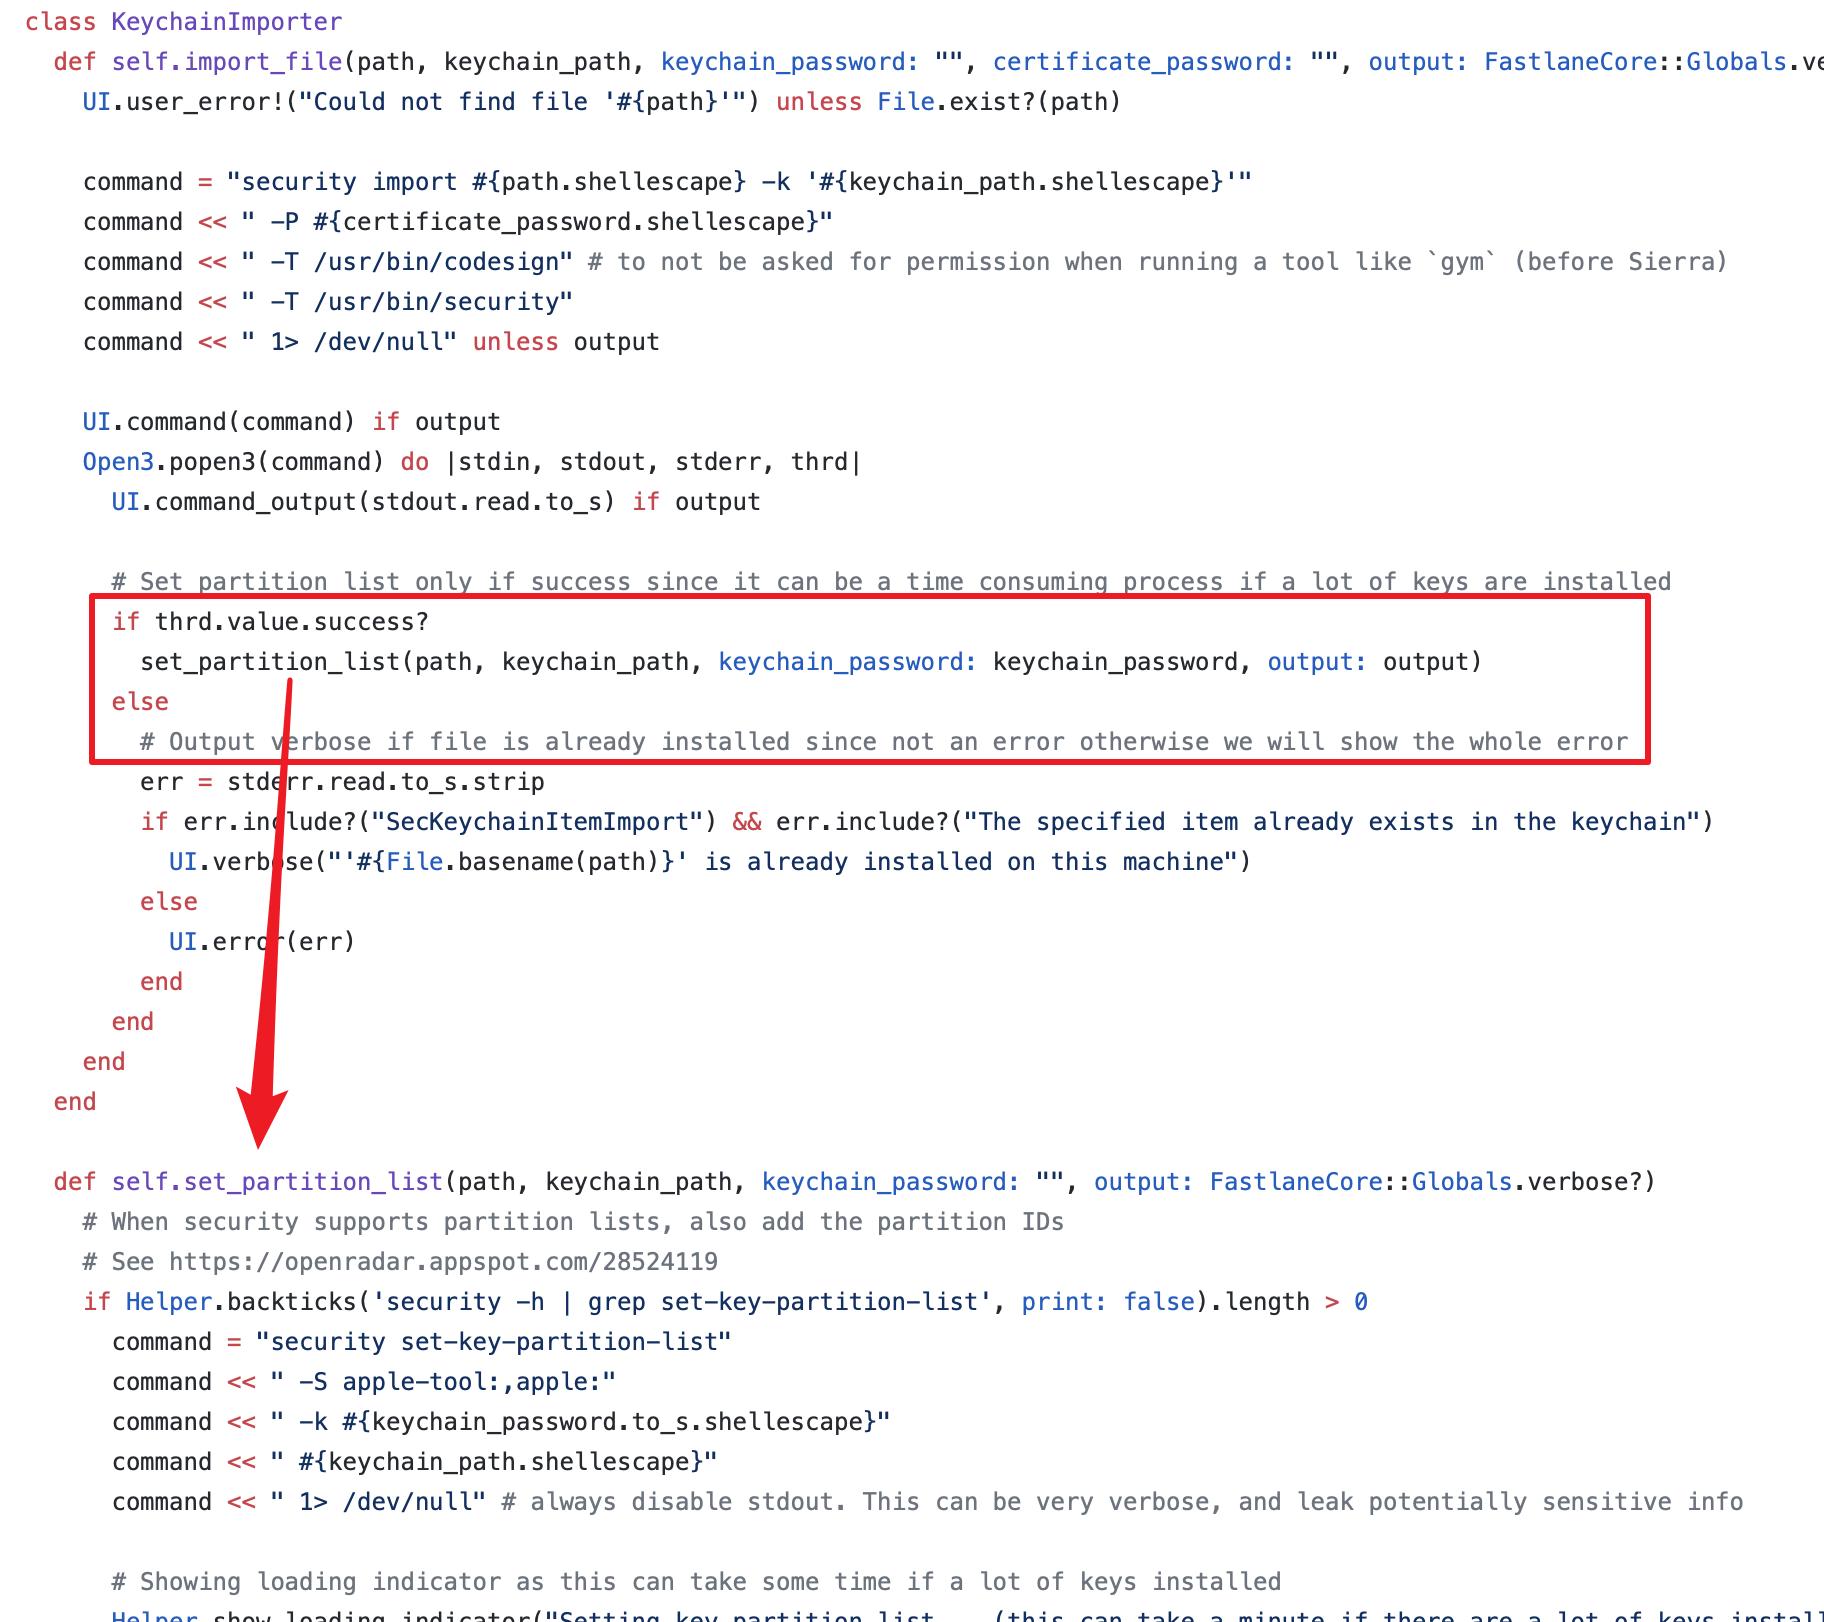 keychain_importer_1